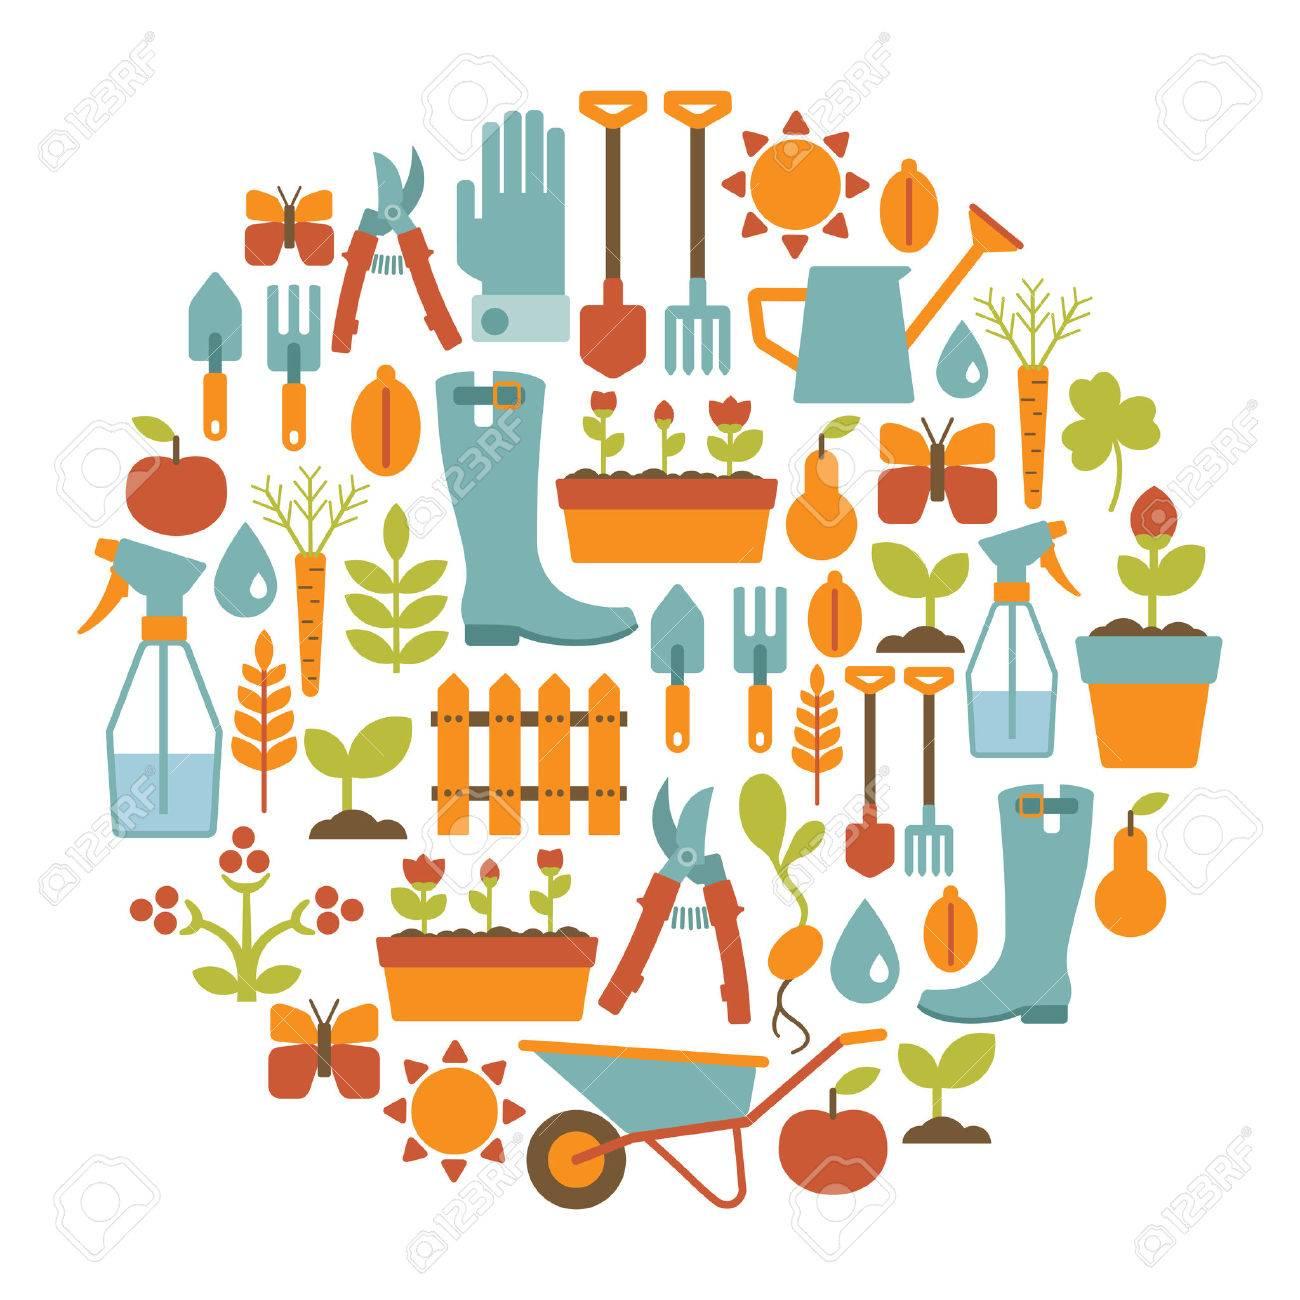 Garden Design Elements round card with gardening design elements royalty free cliparts